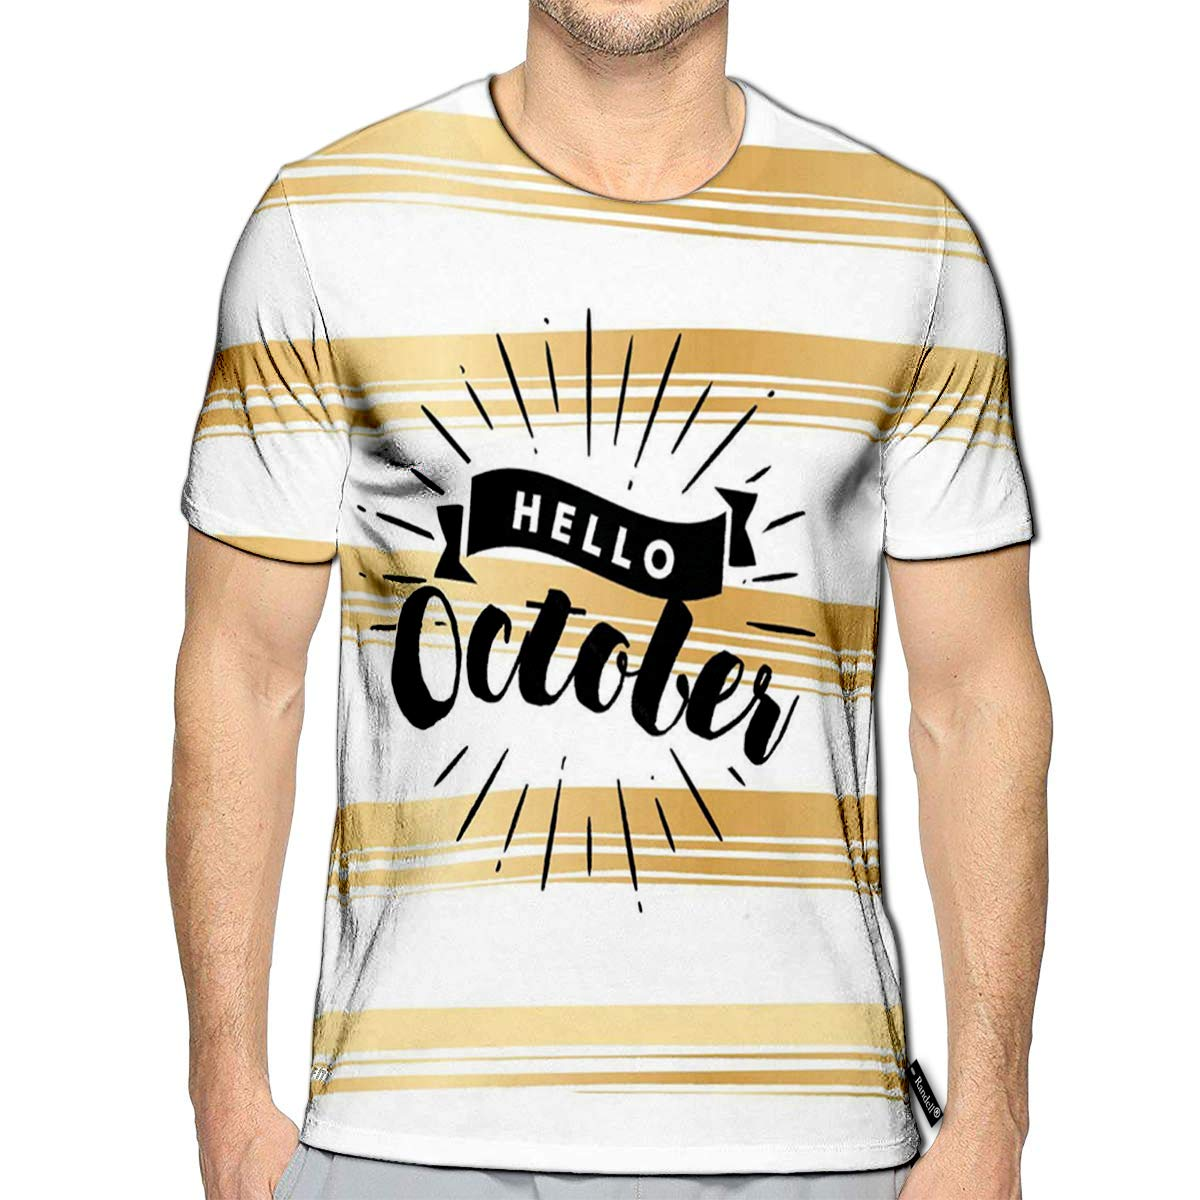 Randell 3D Printed T-Shirts Hello October Calendar Short Sleeve Tops Tees